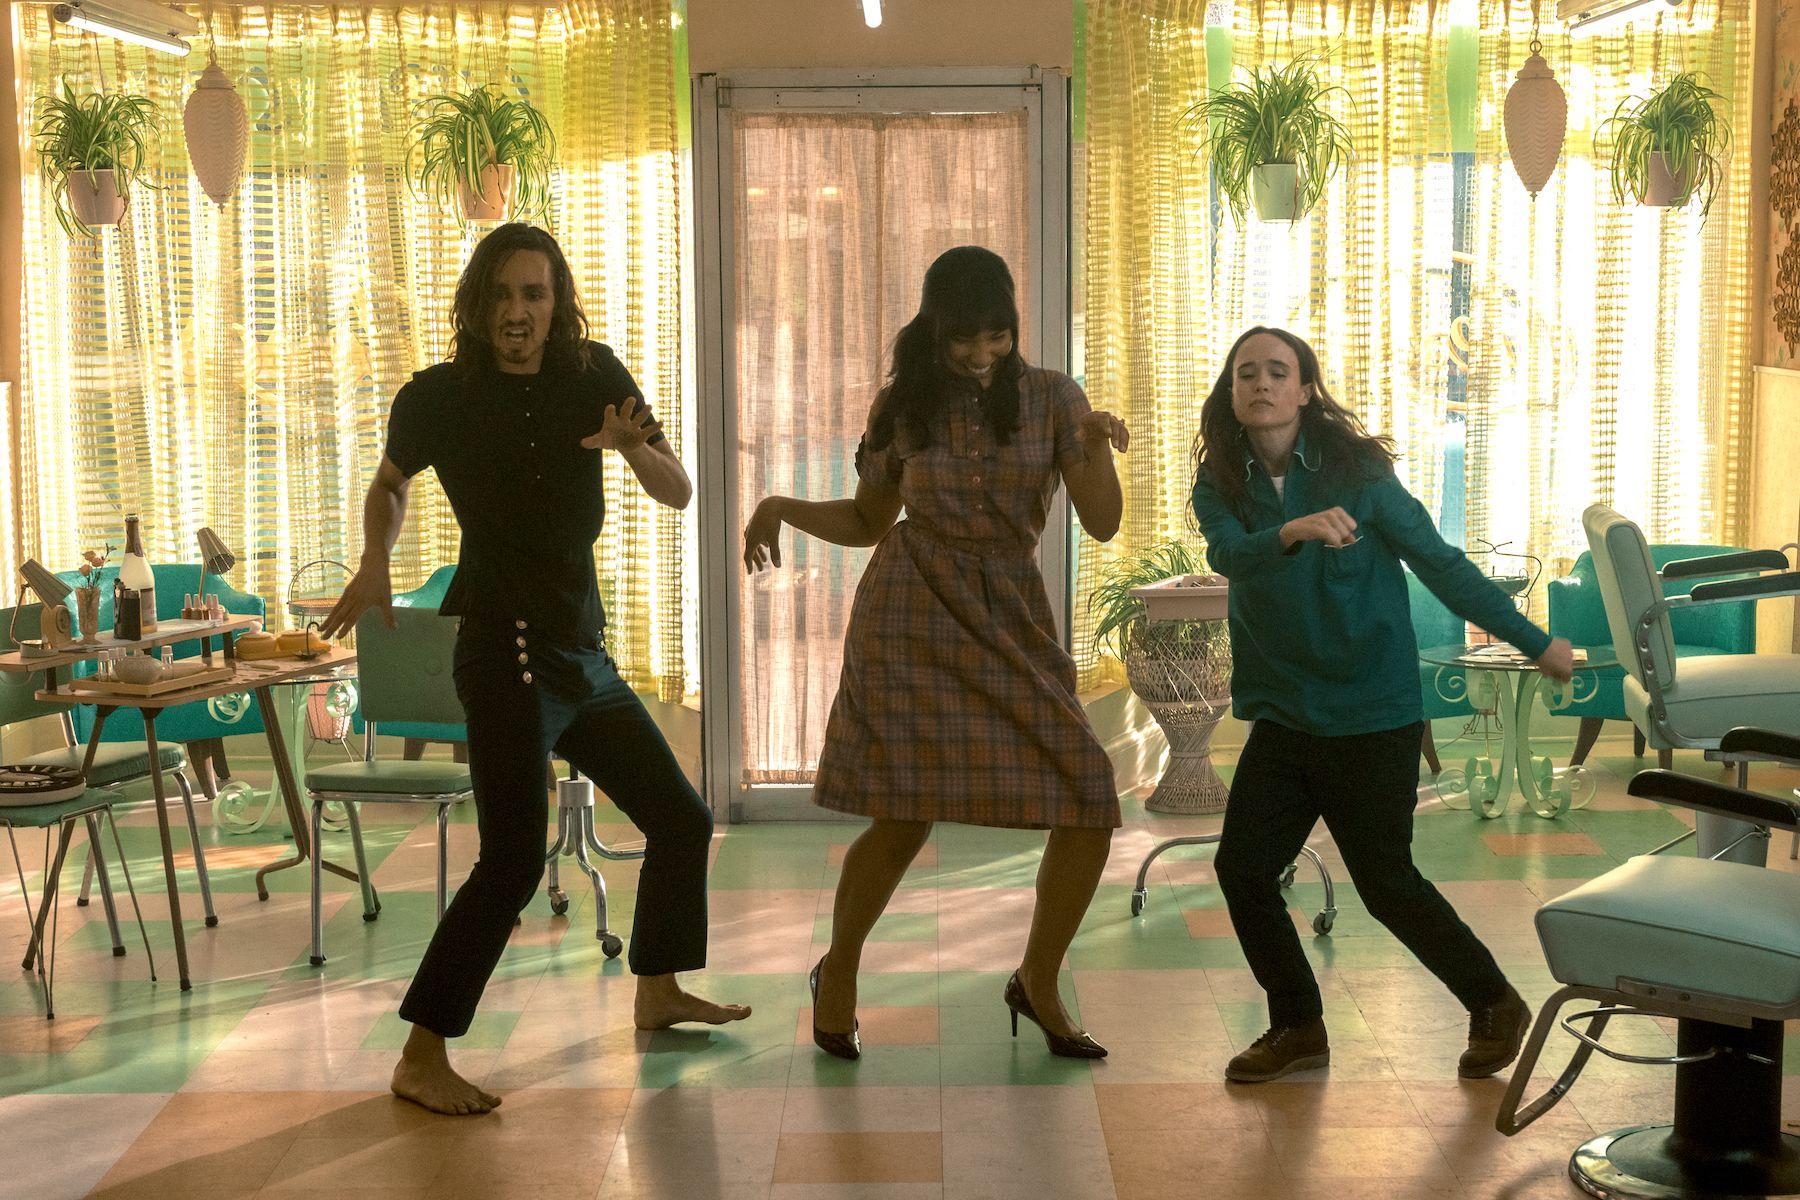 The Complete Umbrella Academy Season 2 Soundtrack